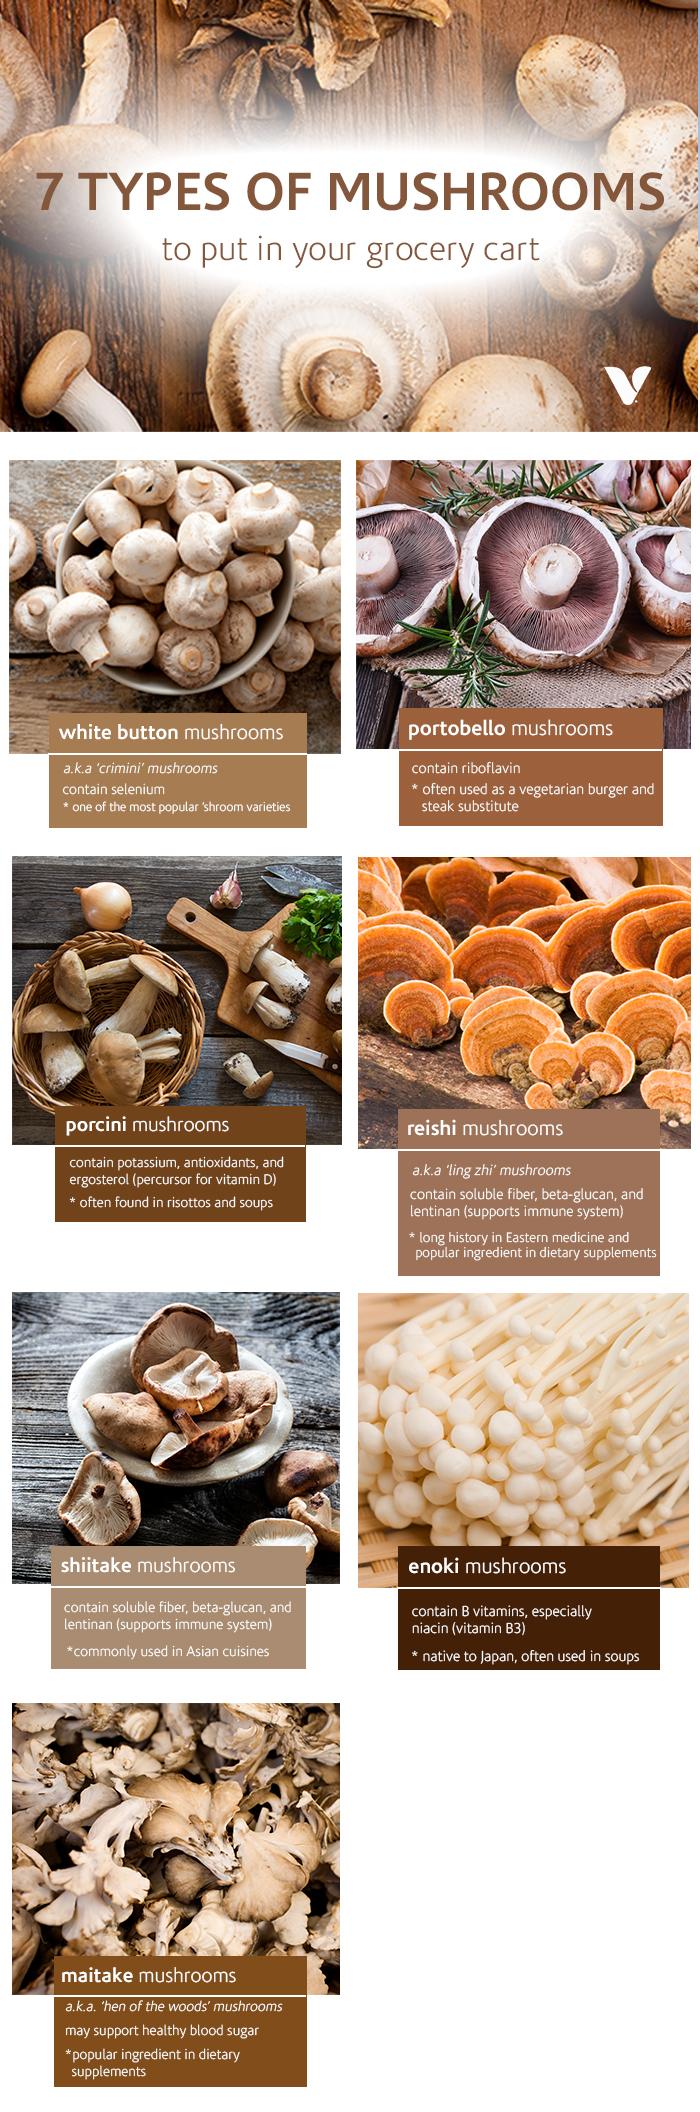 7 Types Of Mushrooms.jpg